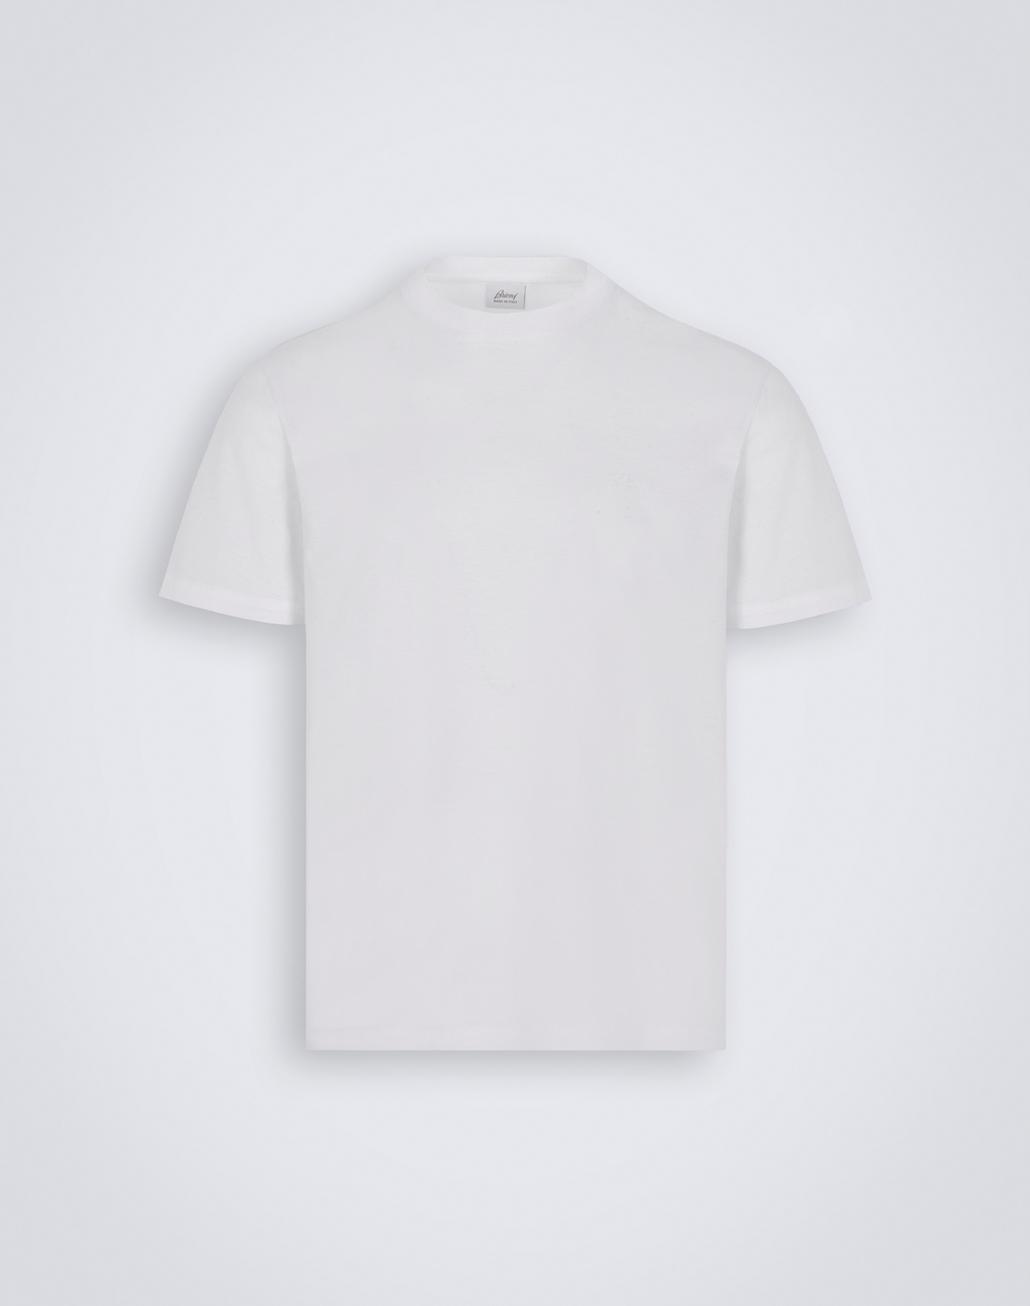 BRIONI White Crewneck T-Shirt. T-Shirts & Polos Man f